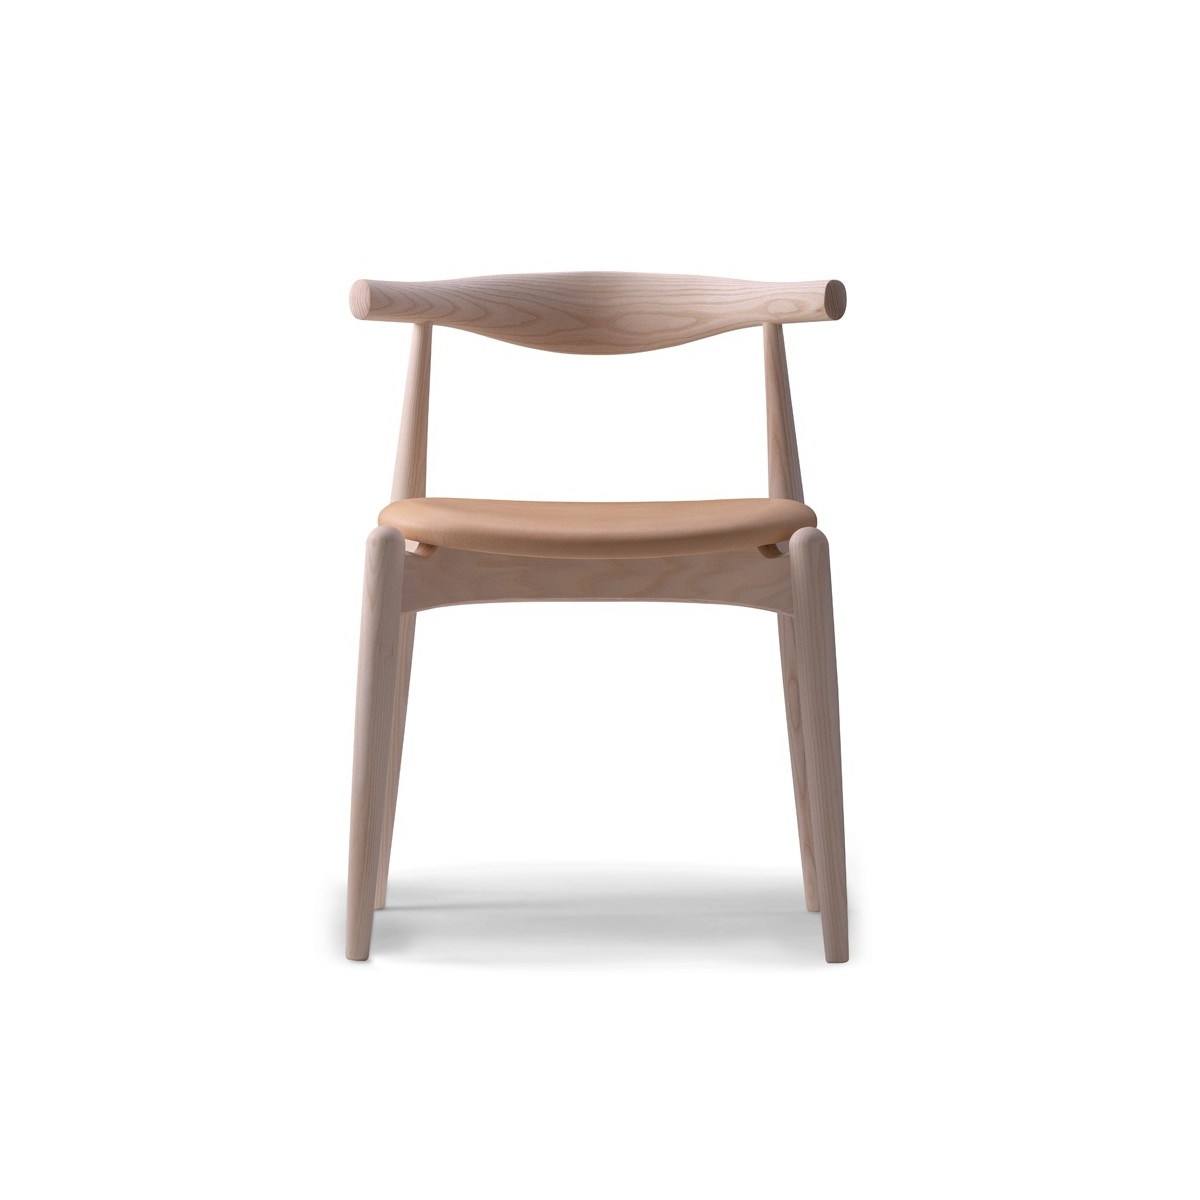 Krzesło dębowe Elbow CH 20 Carl Hansen